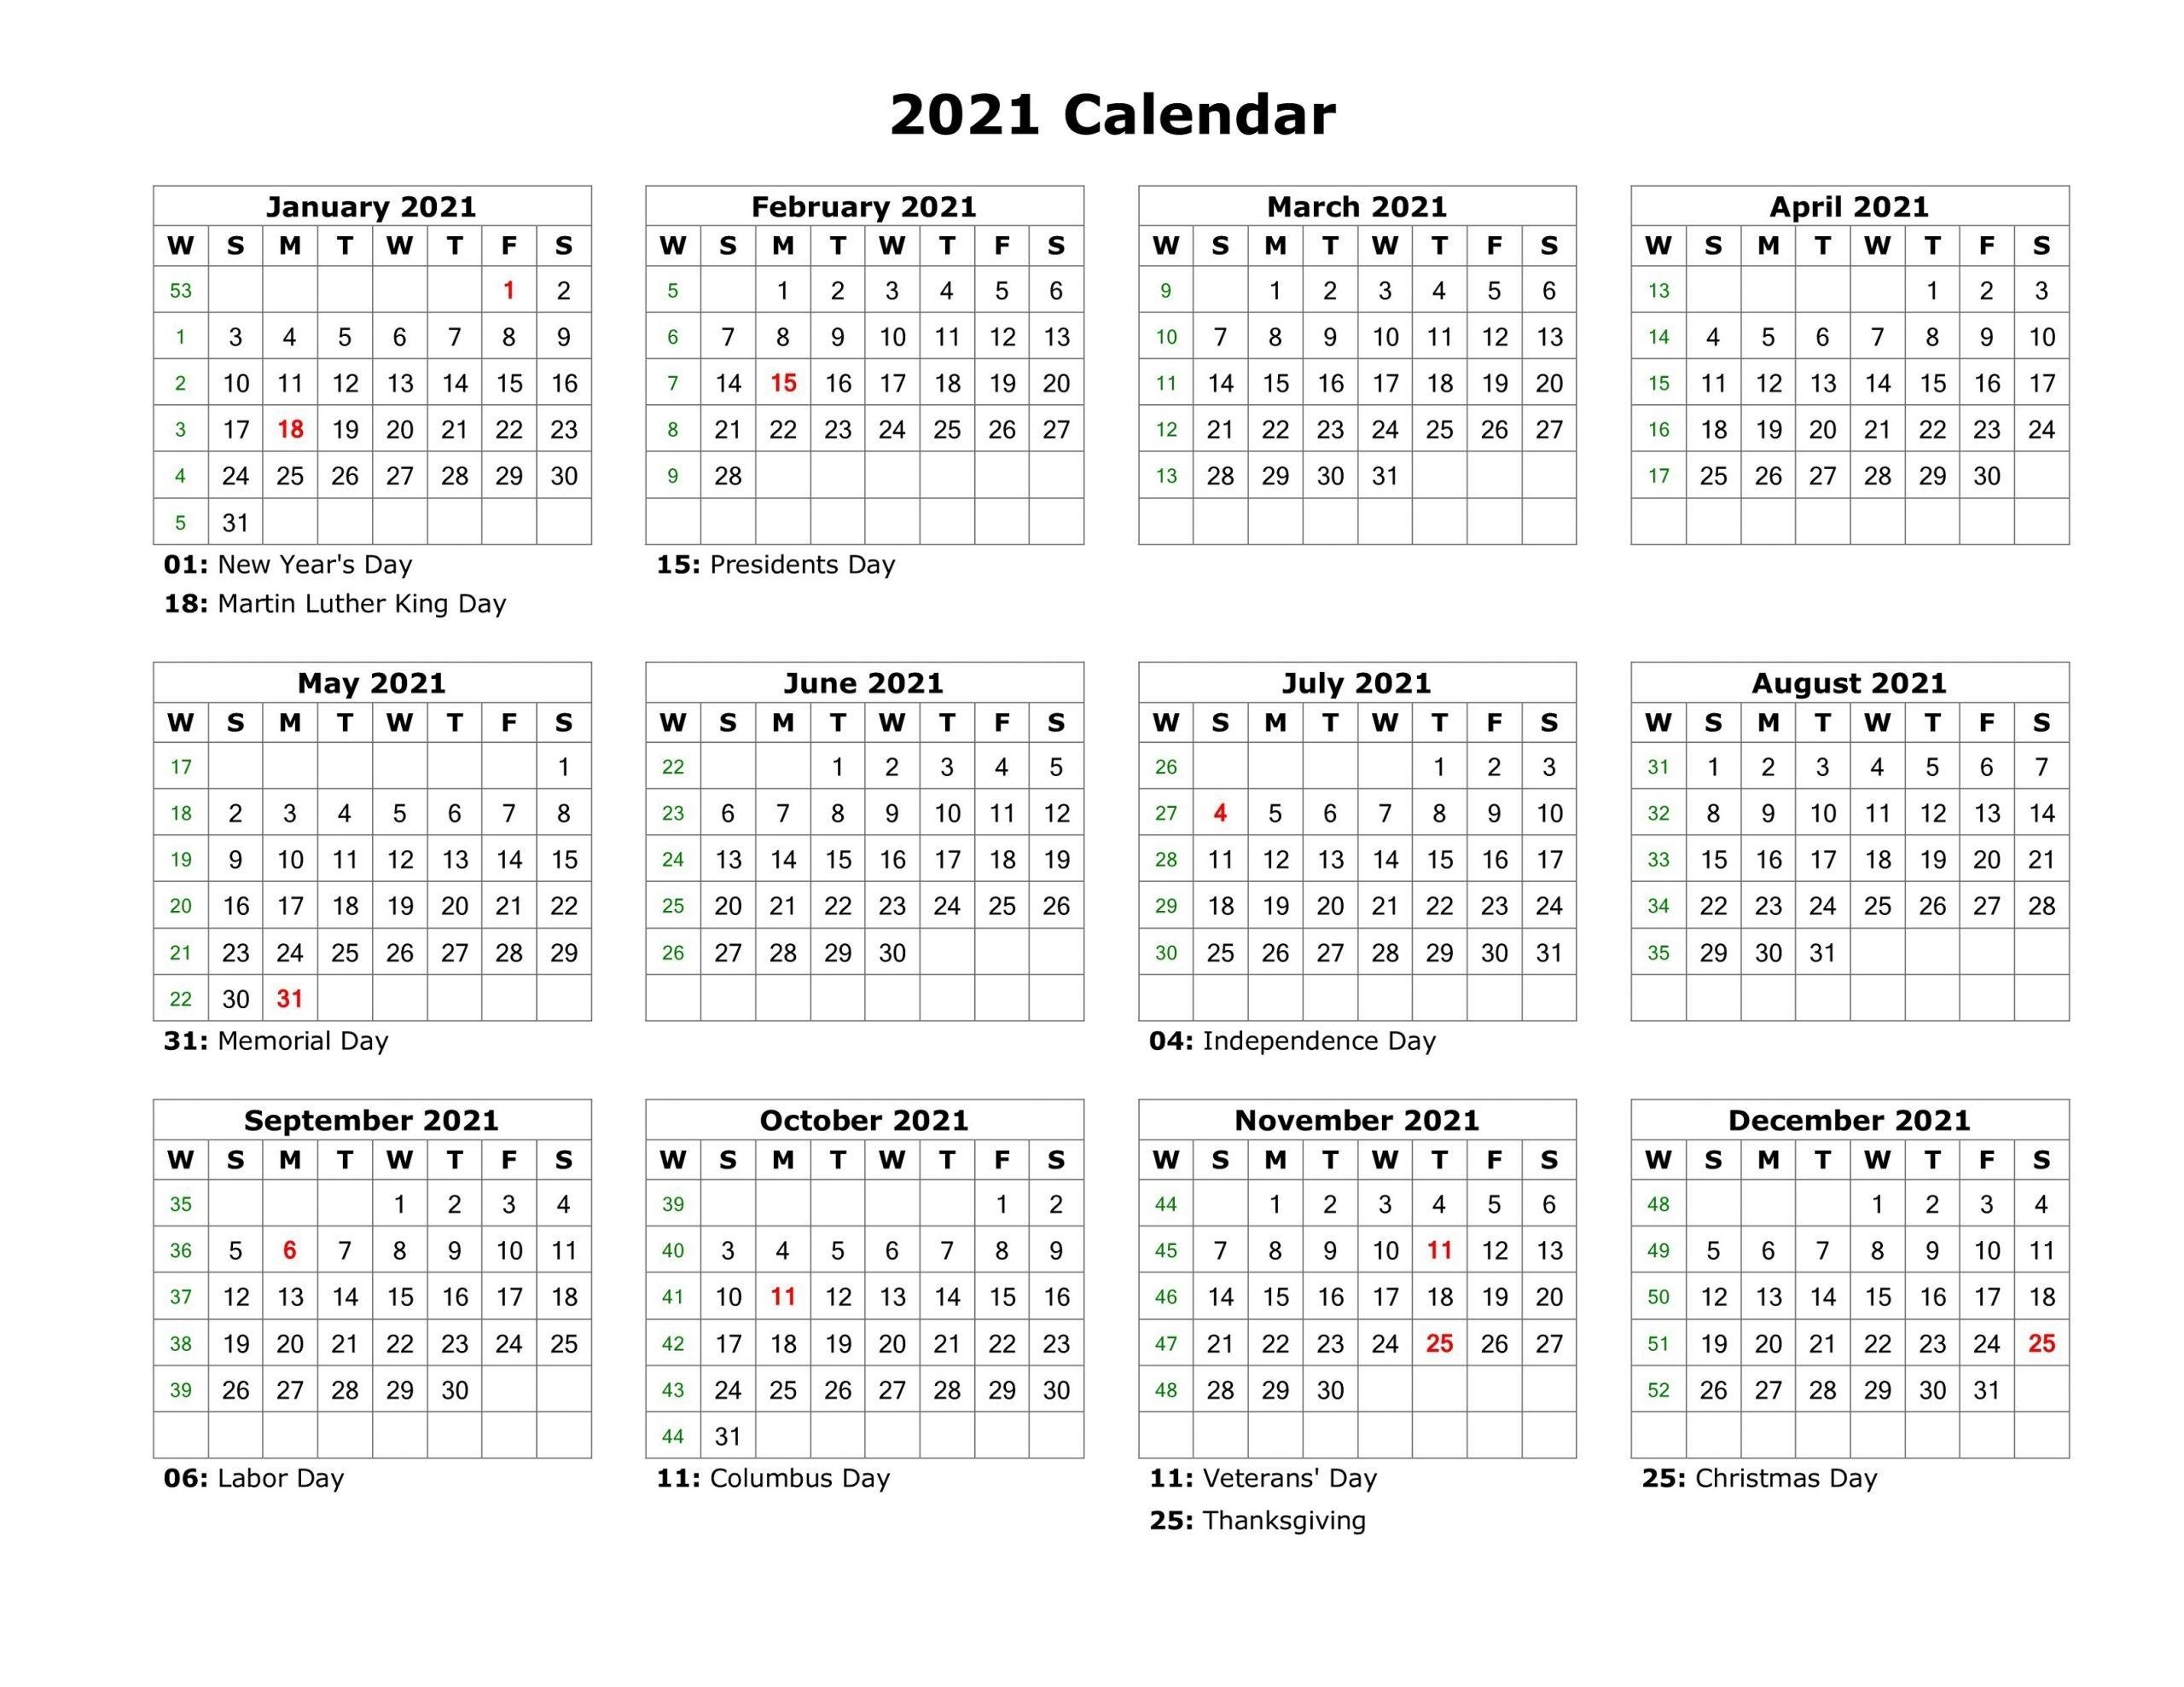 Calendar 2021 - 2021 Free | Calendar Template 2021